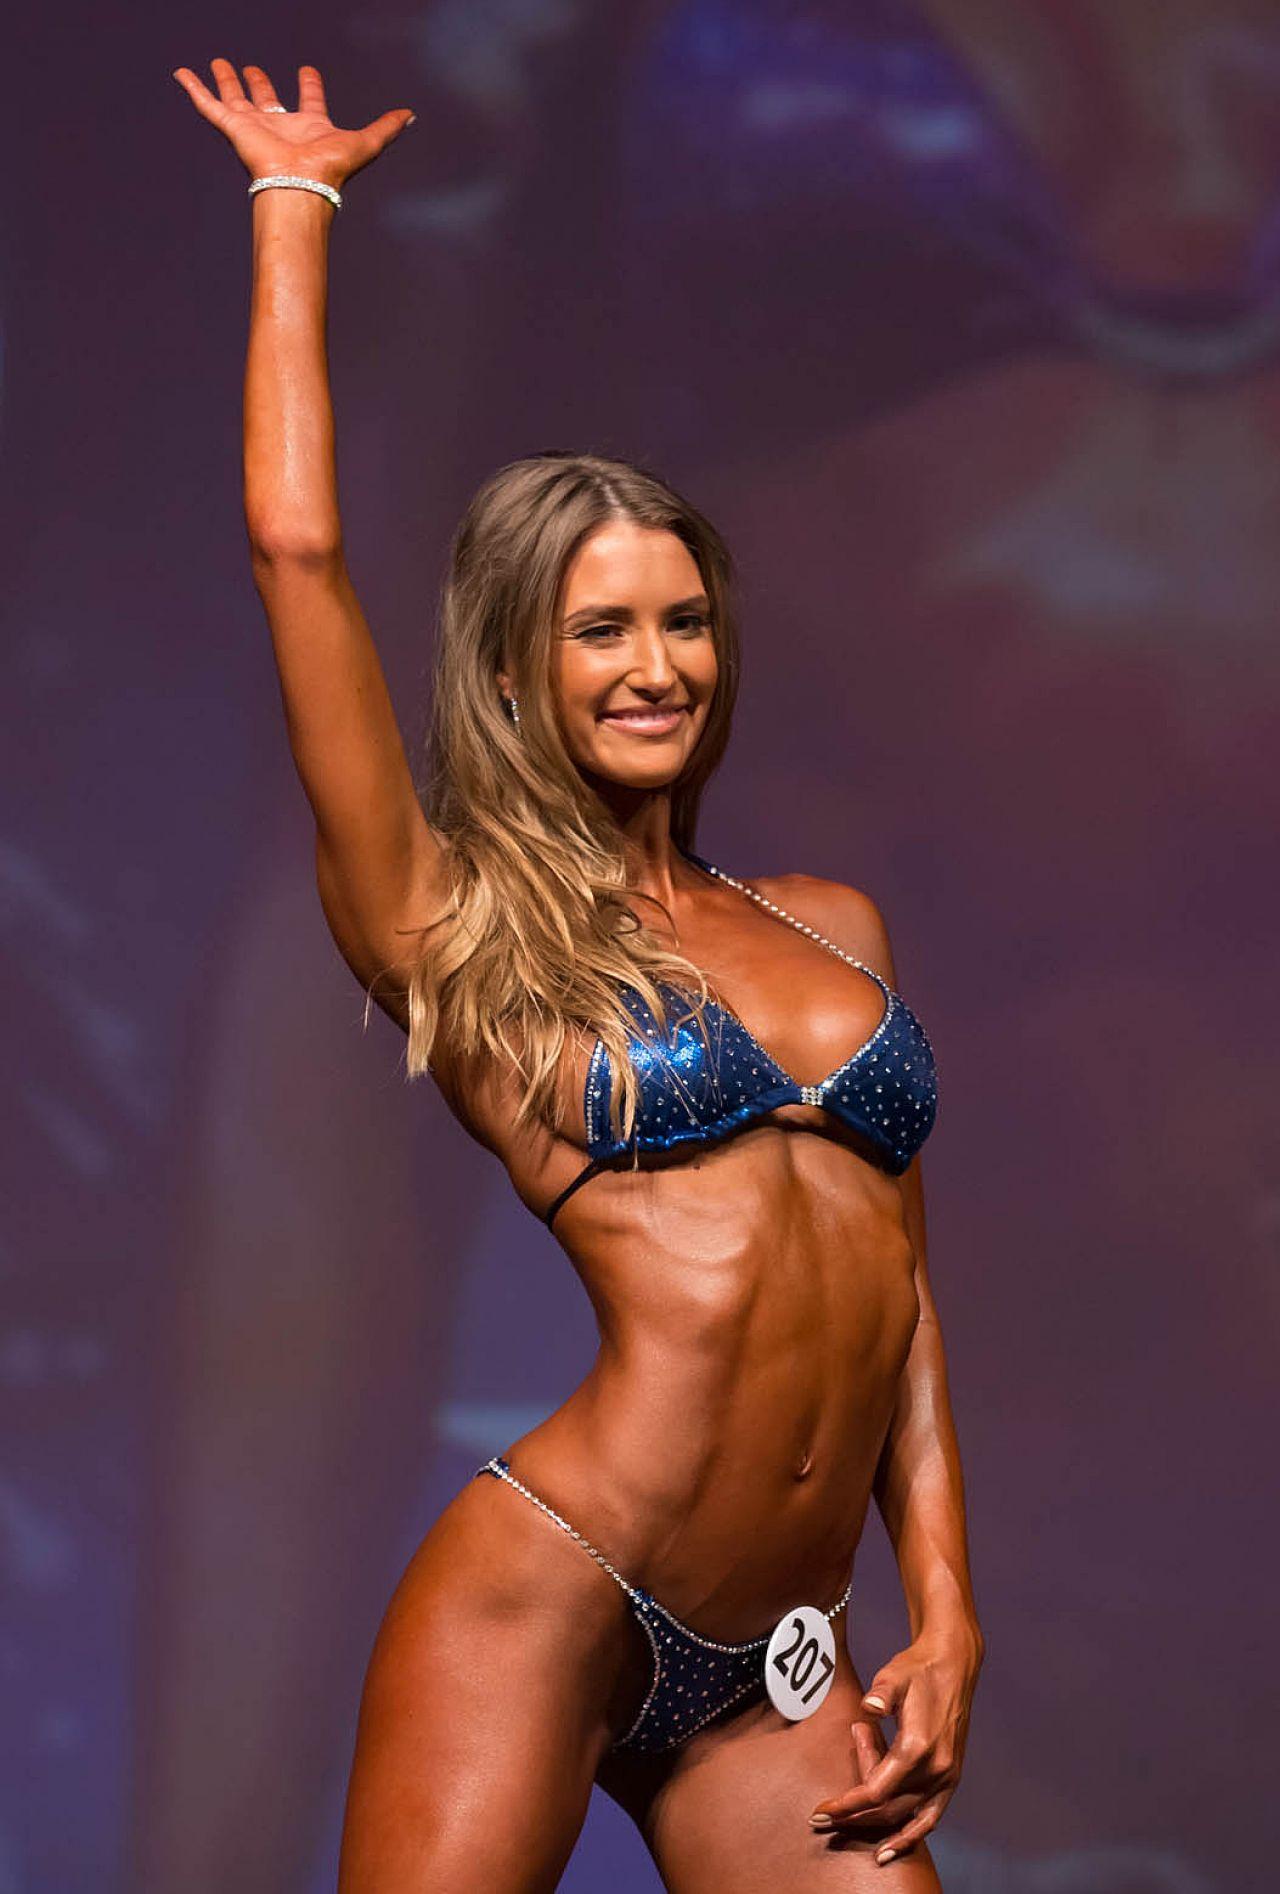 danica-thrall-2014-miami-pro-fitness-ms-bikini_10.jpg